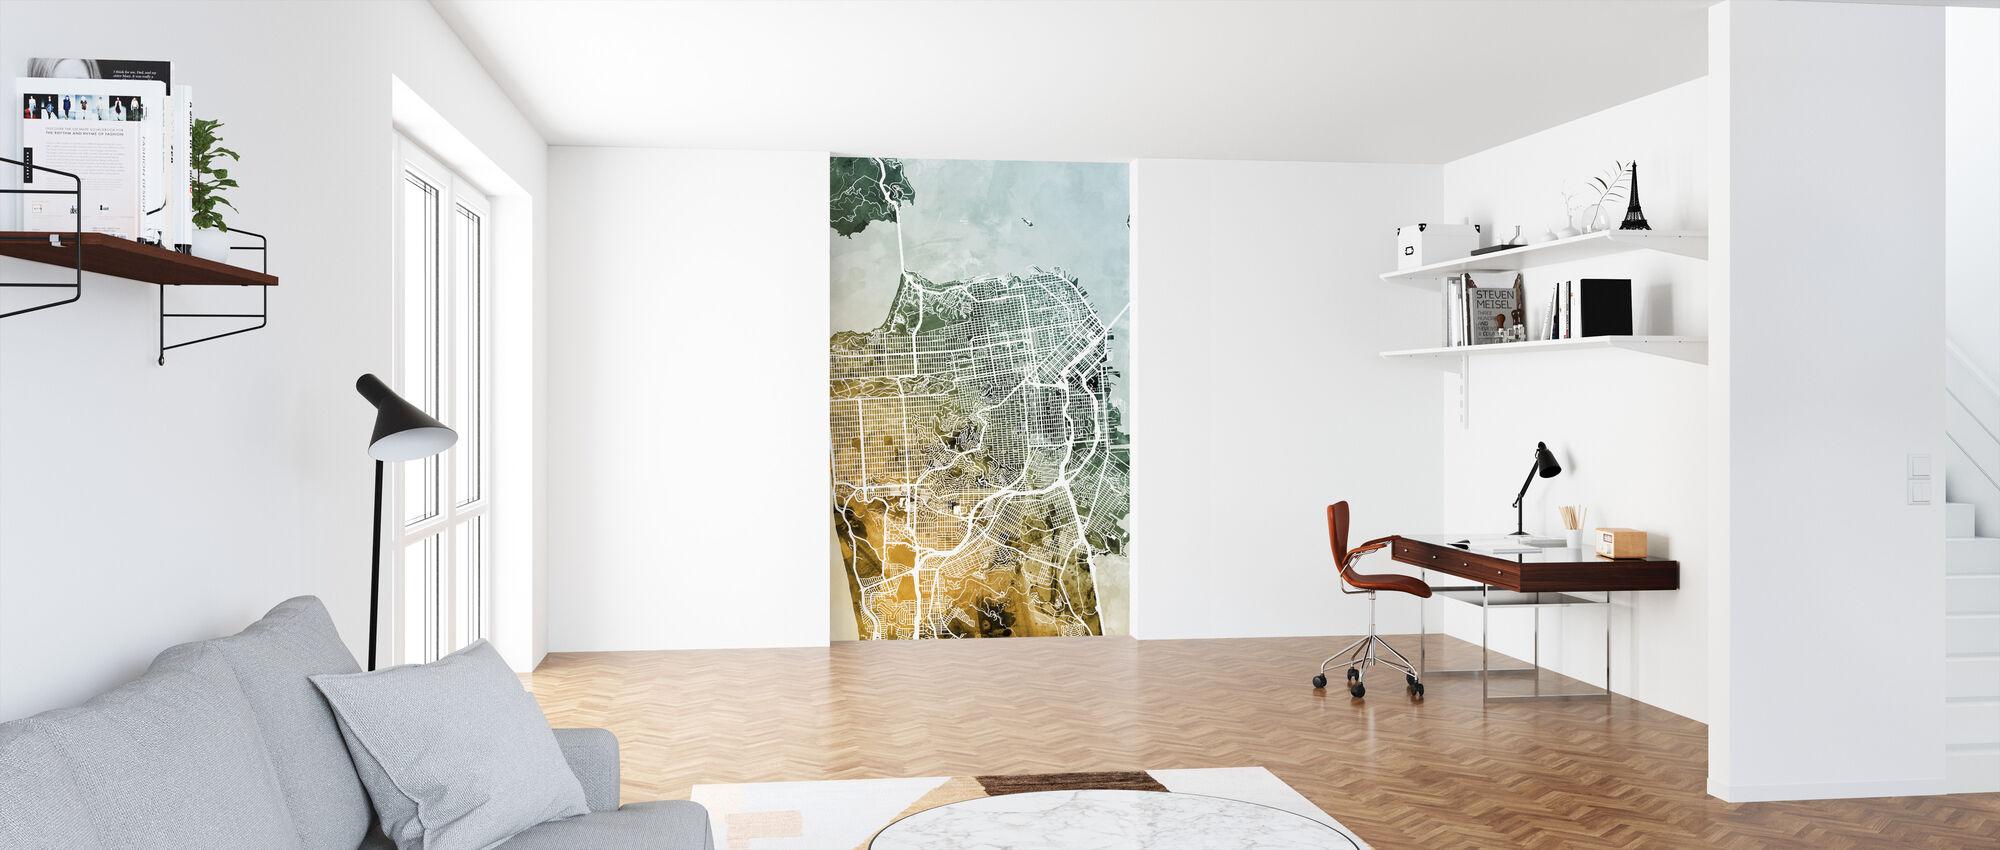 San Francisco City Street Map - Wallpaper - Office